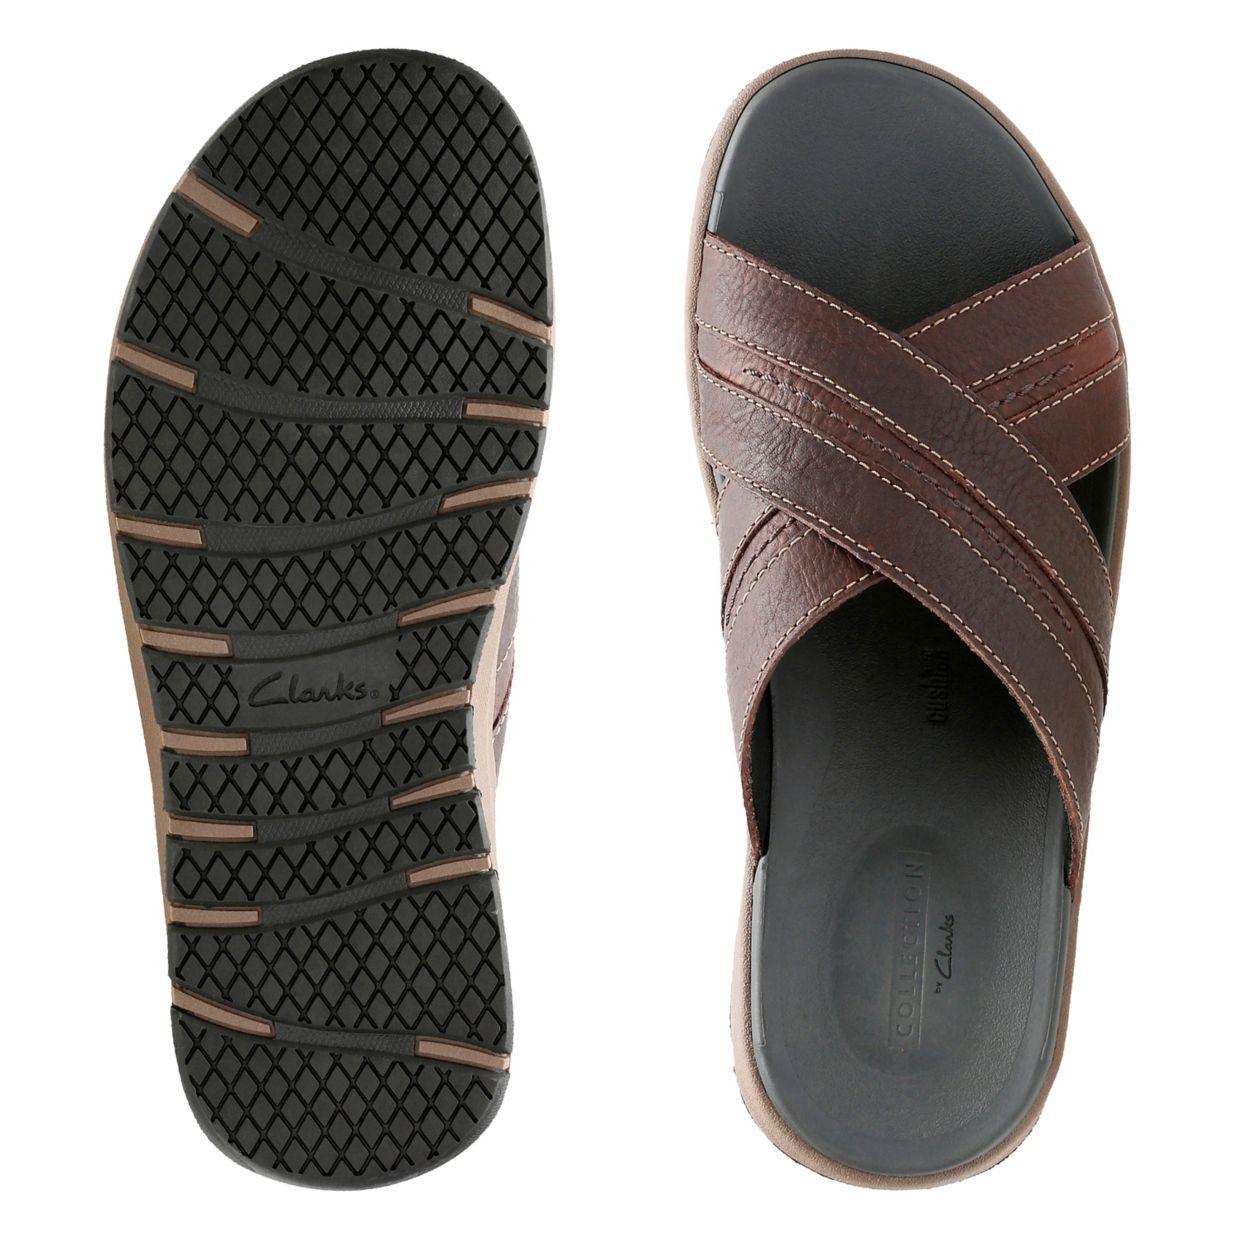 Brixby Cross Mens Clarks Slip On Sandals